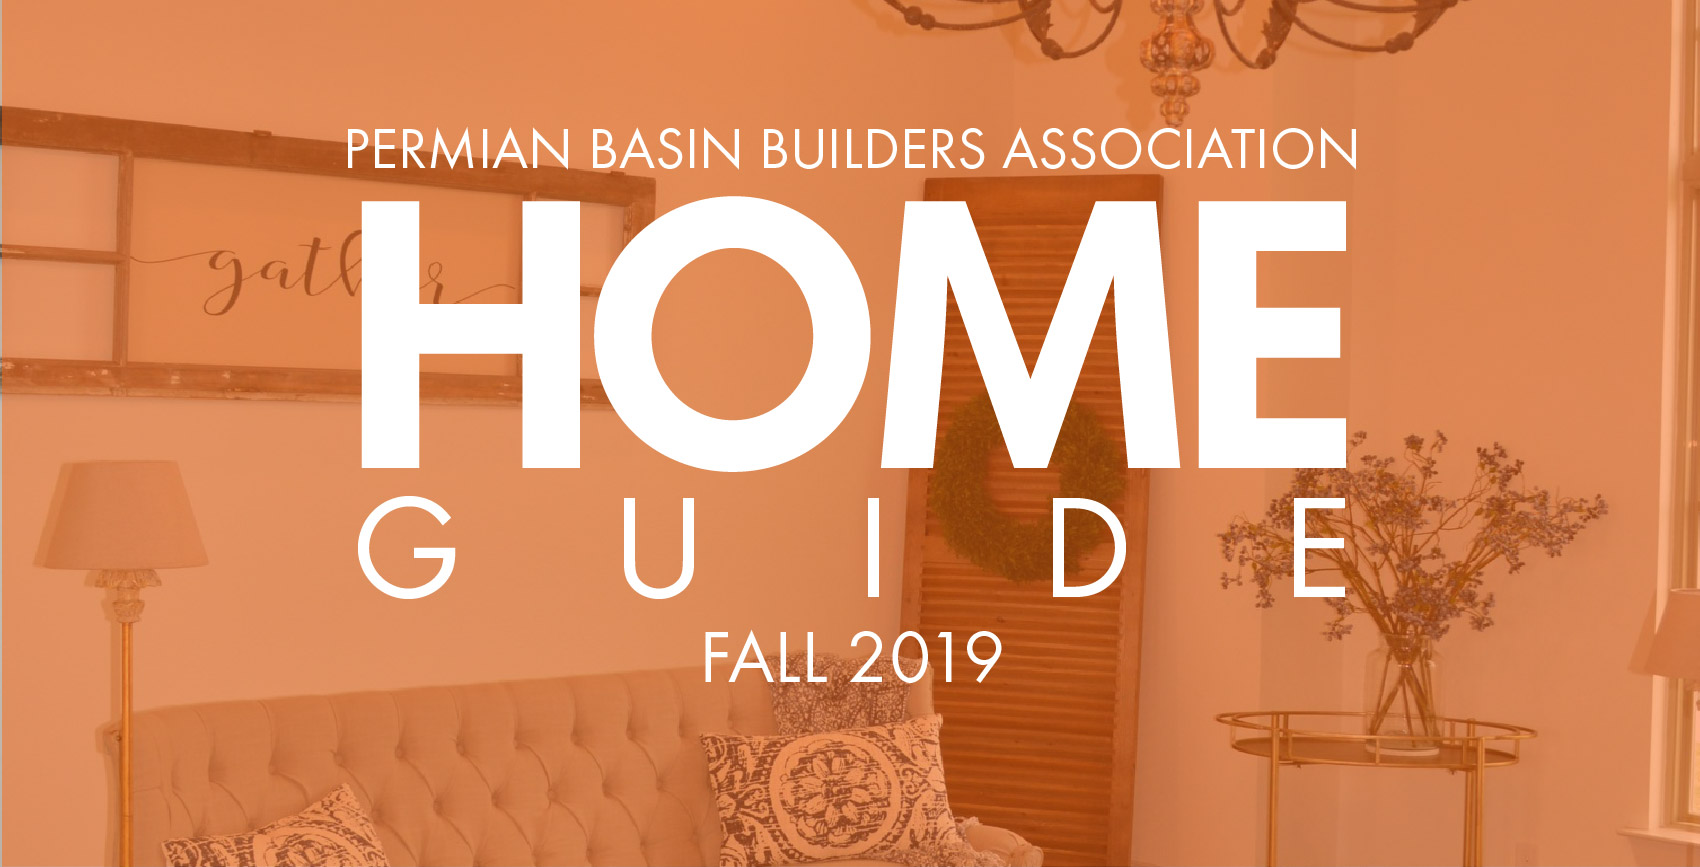 2019 Fall Parade of Homes Guide